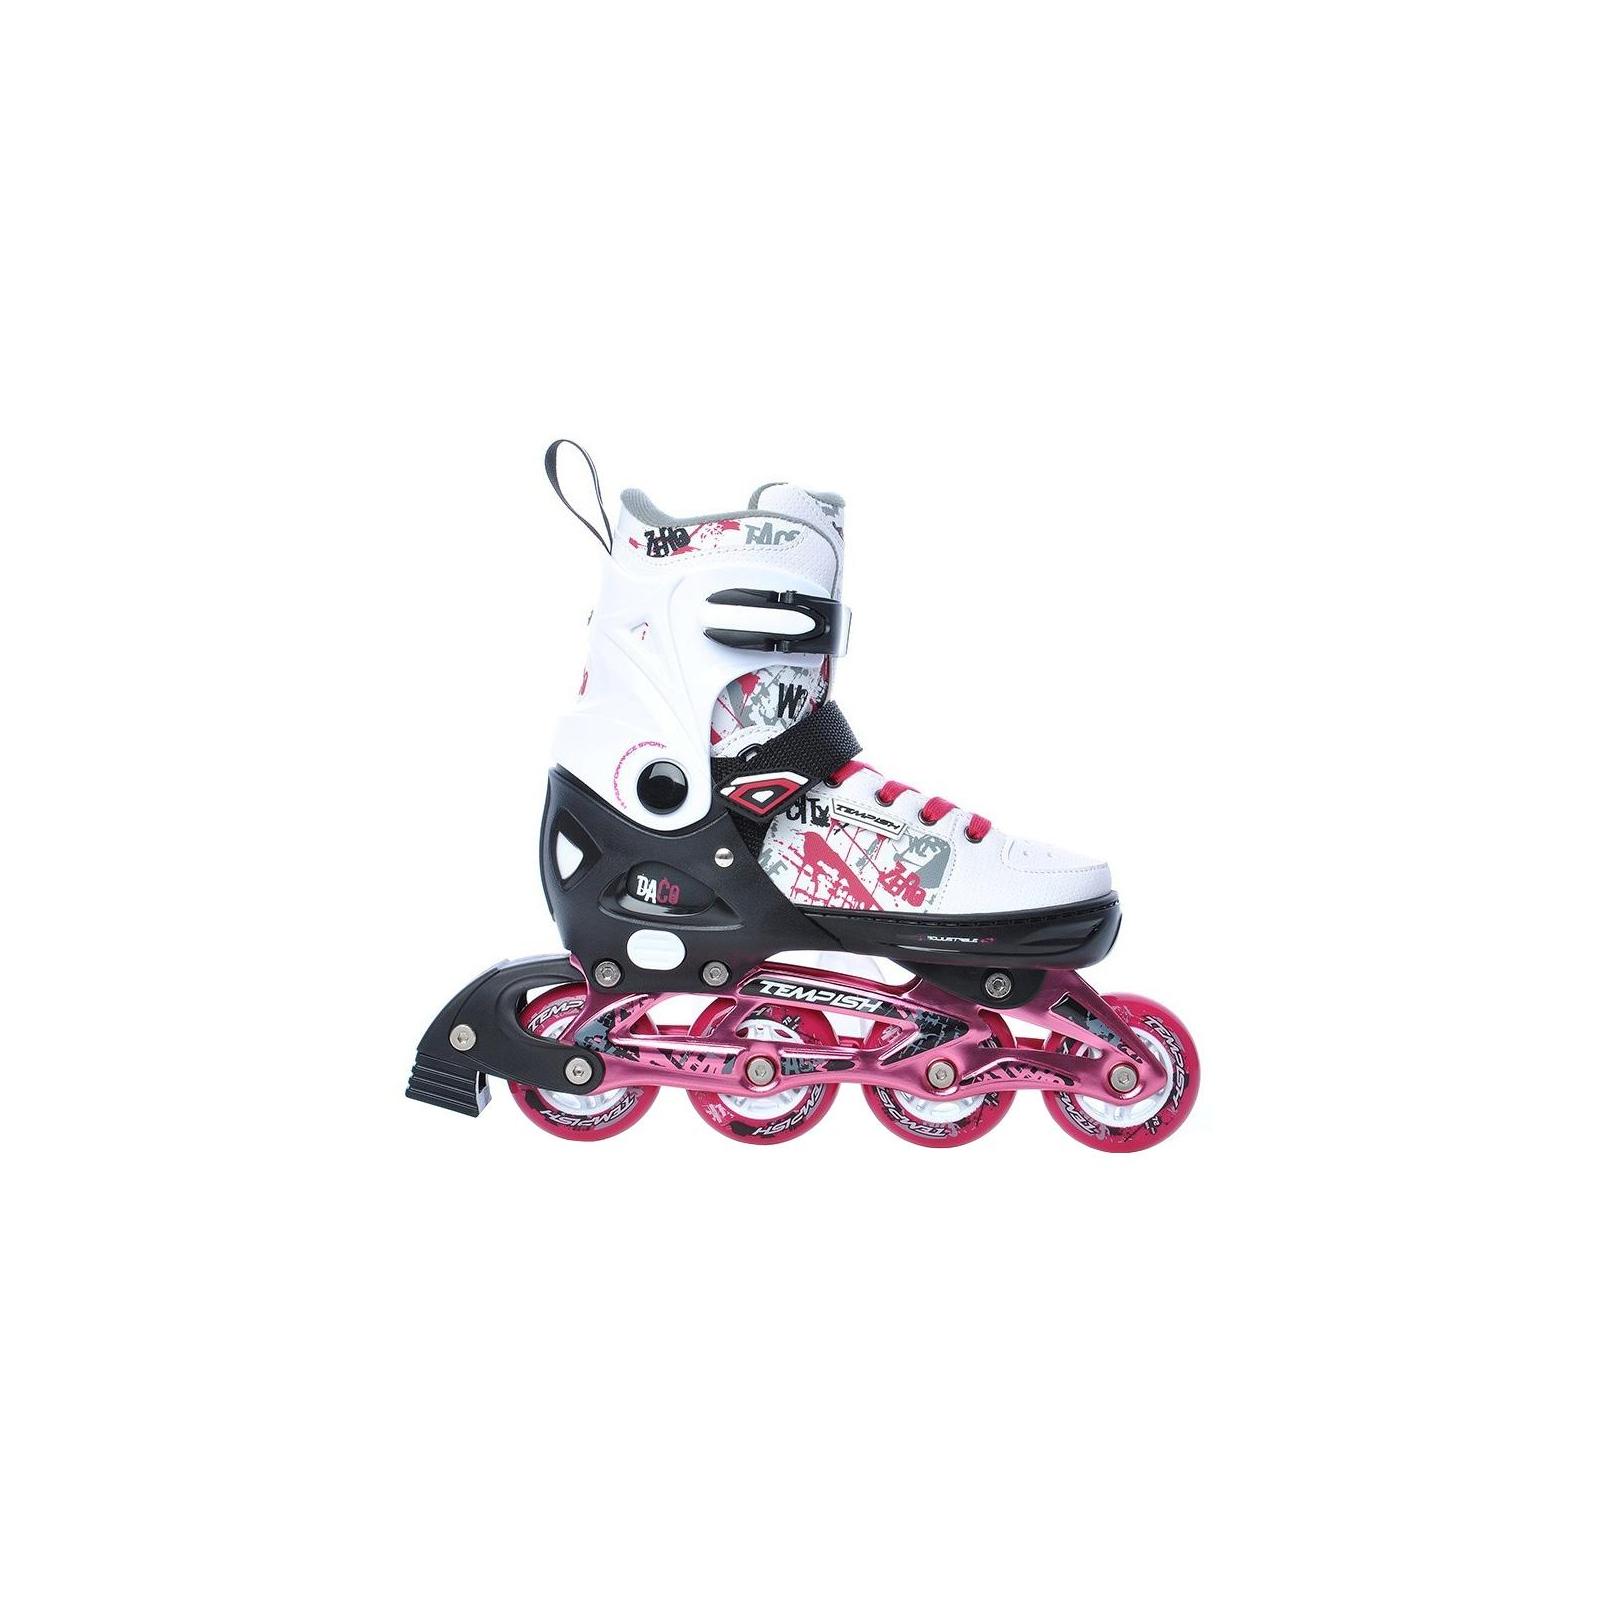 Роликовые коньки Tempish DACO white/37-40 1000027/WHITE/37-40 (1000027/WHITE/37-40)